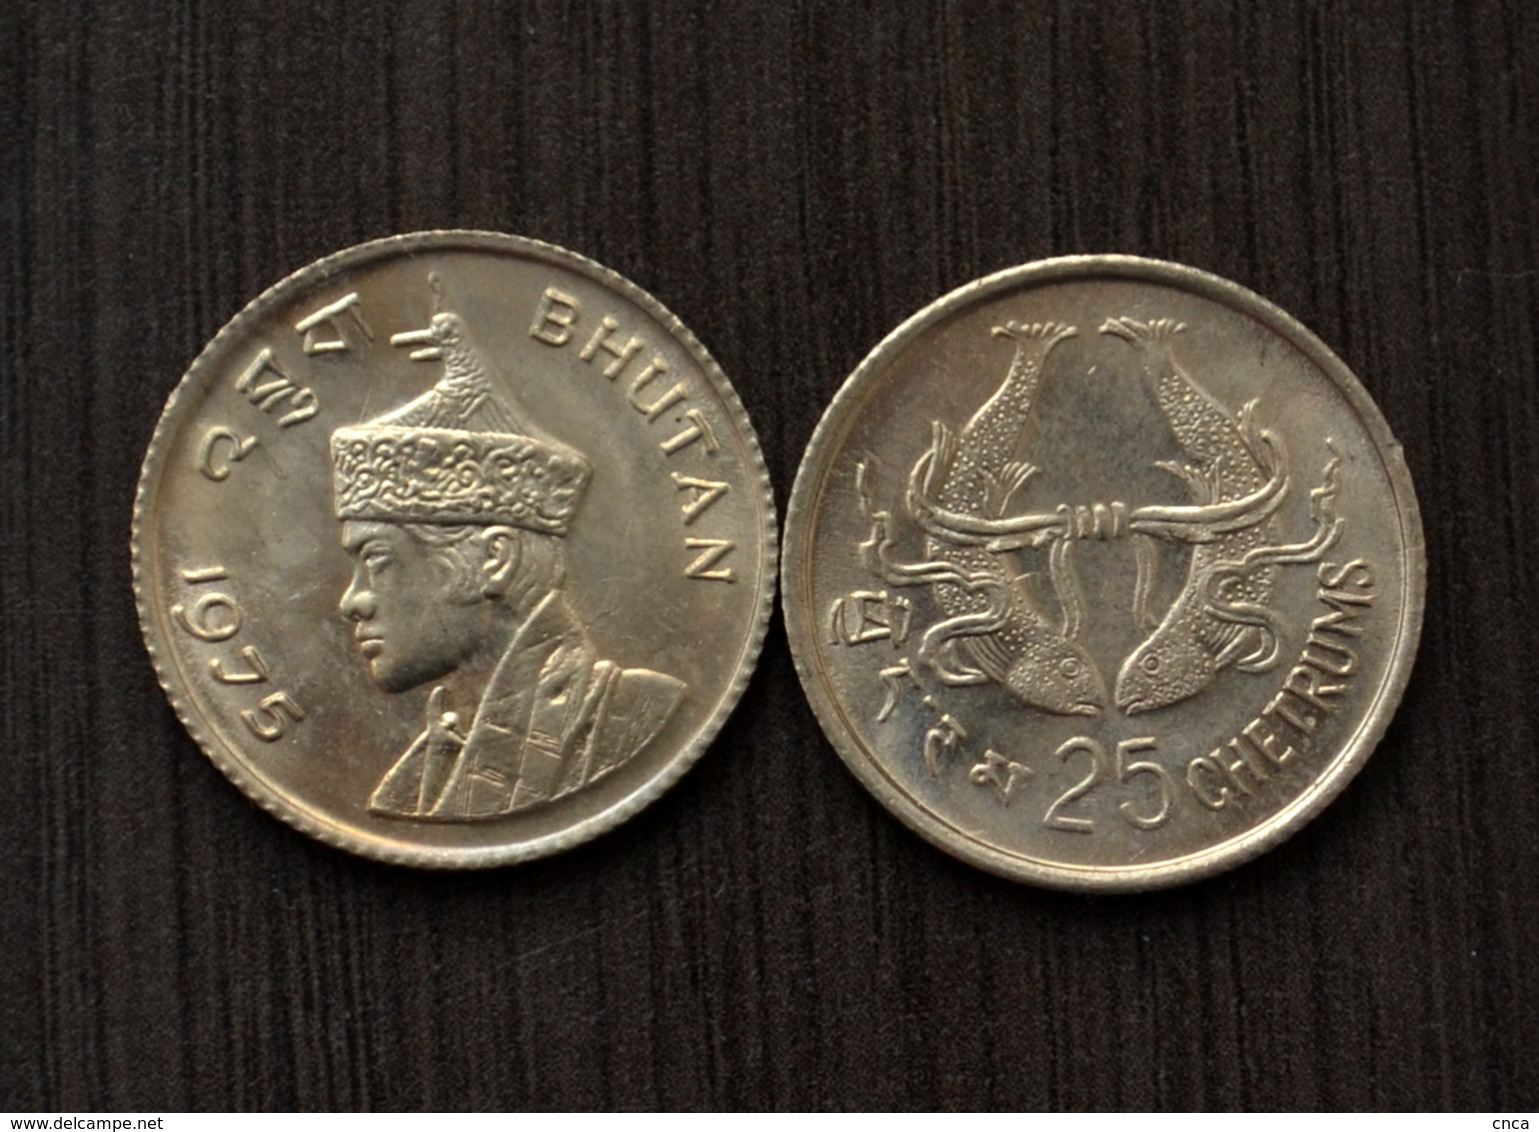 1980 P /& D Mint Set Brilliant Uncirculated US Coins In OGP With Envelope /& COA